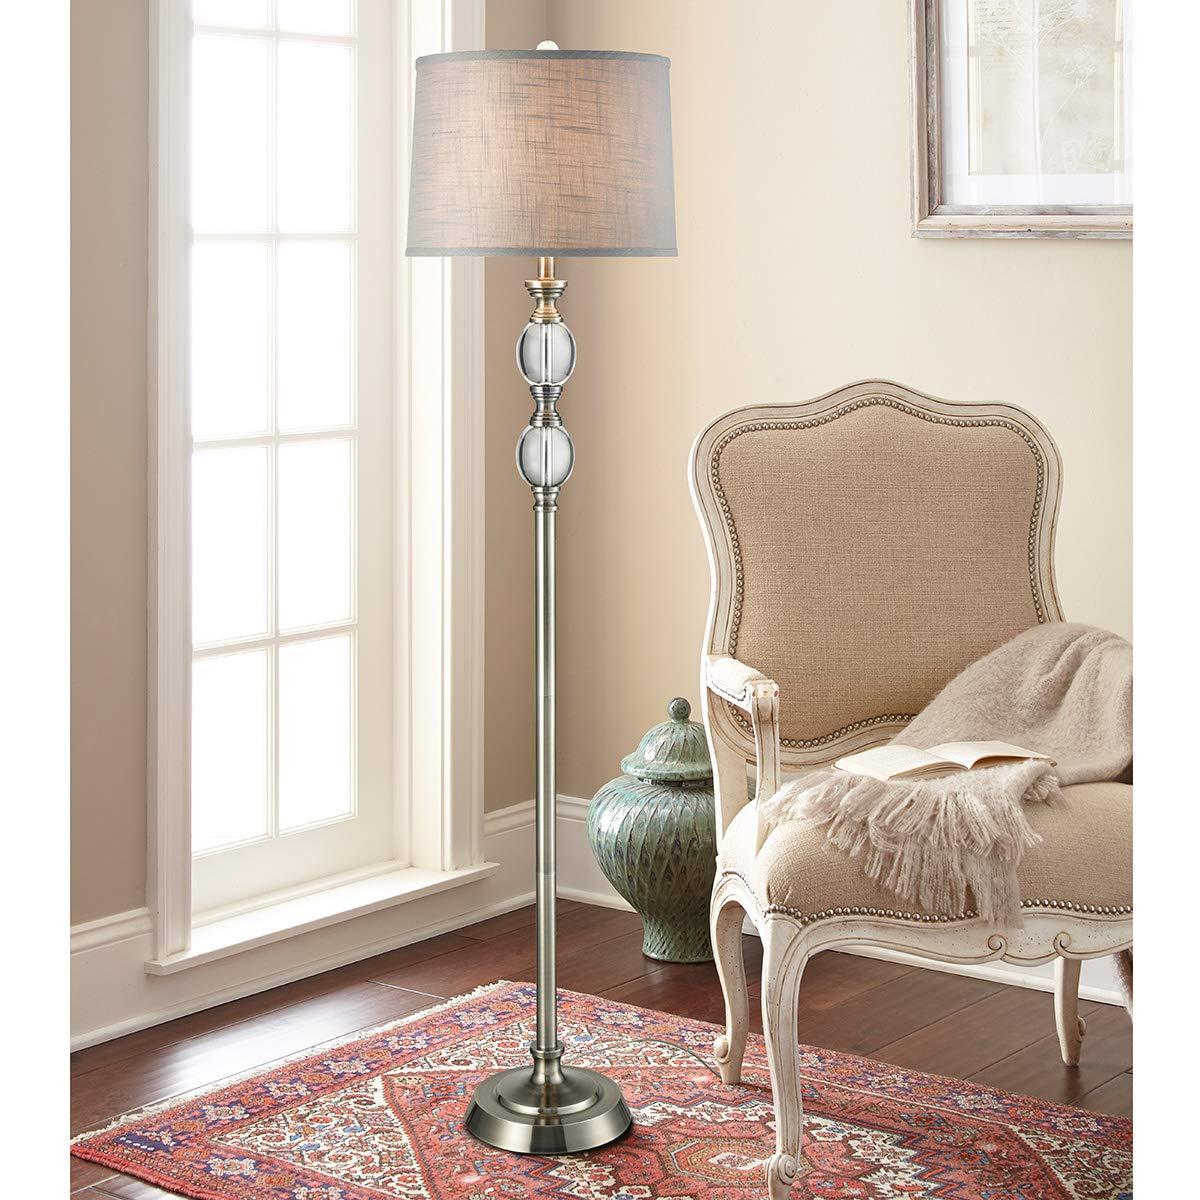 Amazon.com: Lámpara de pie de cristal LED: Home Improvement